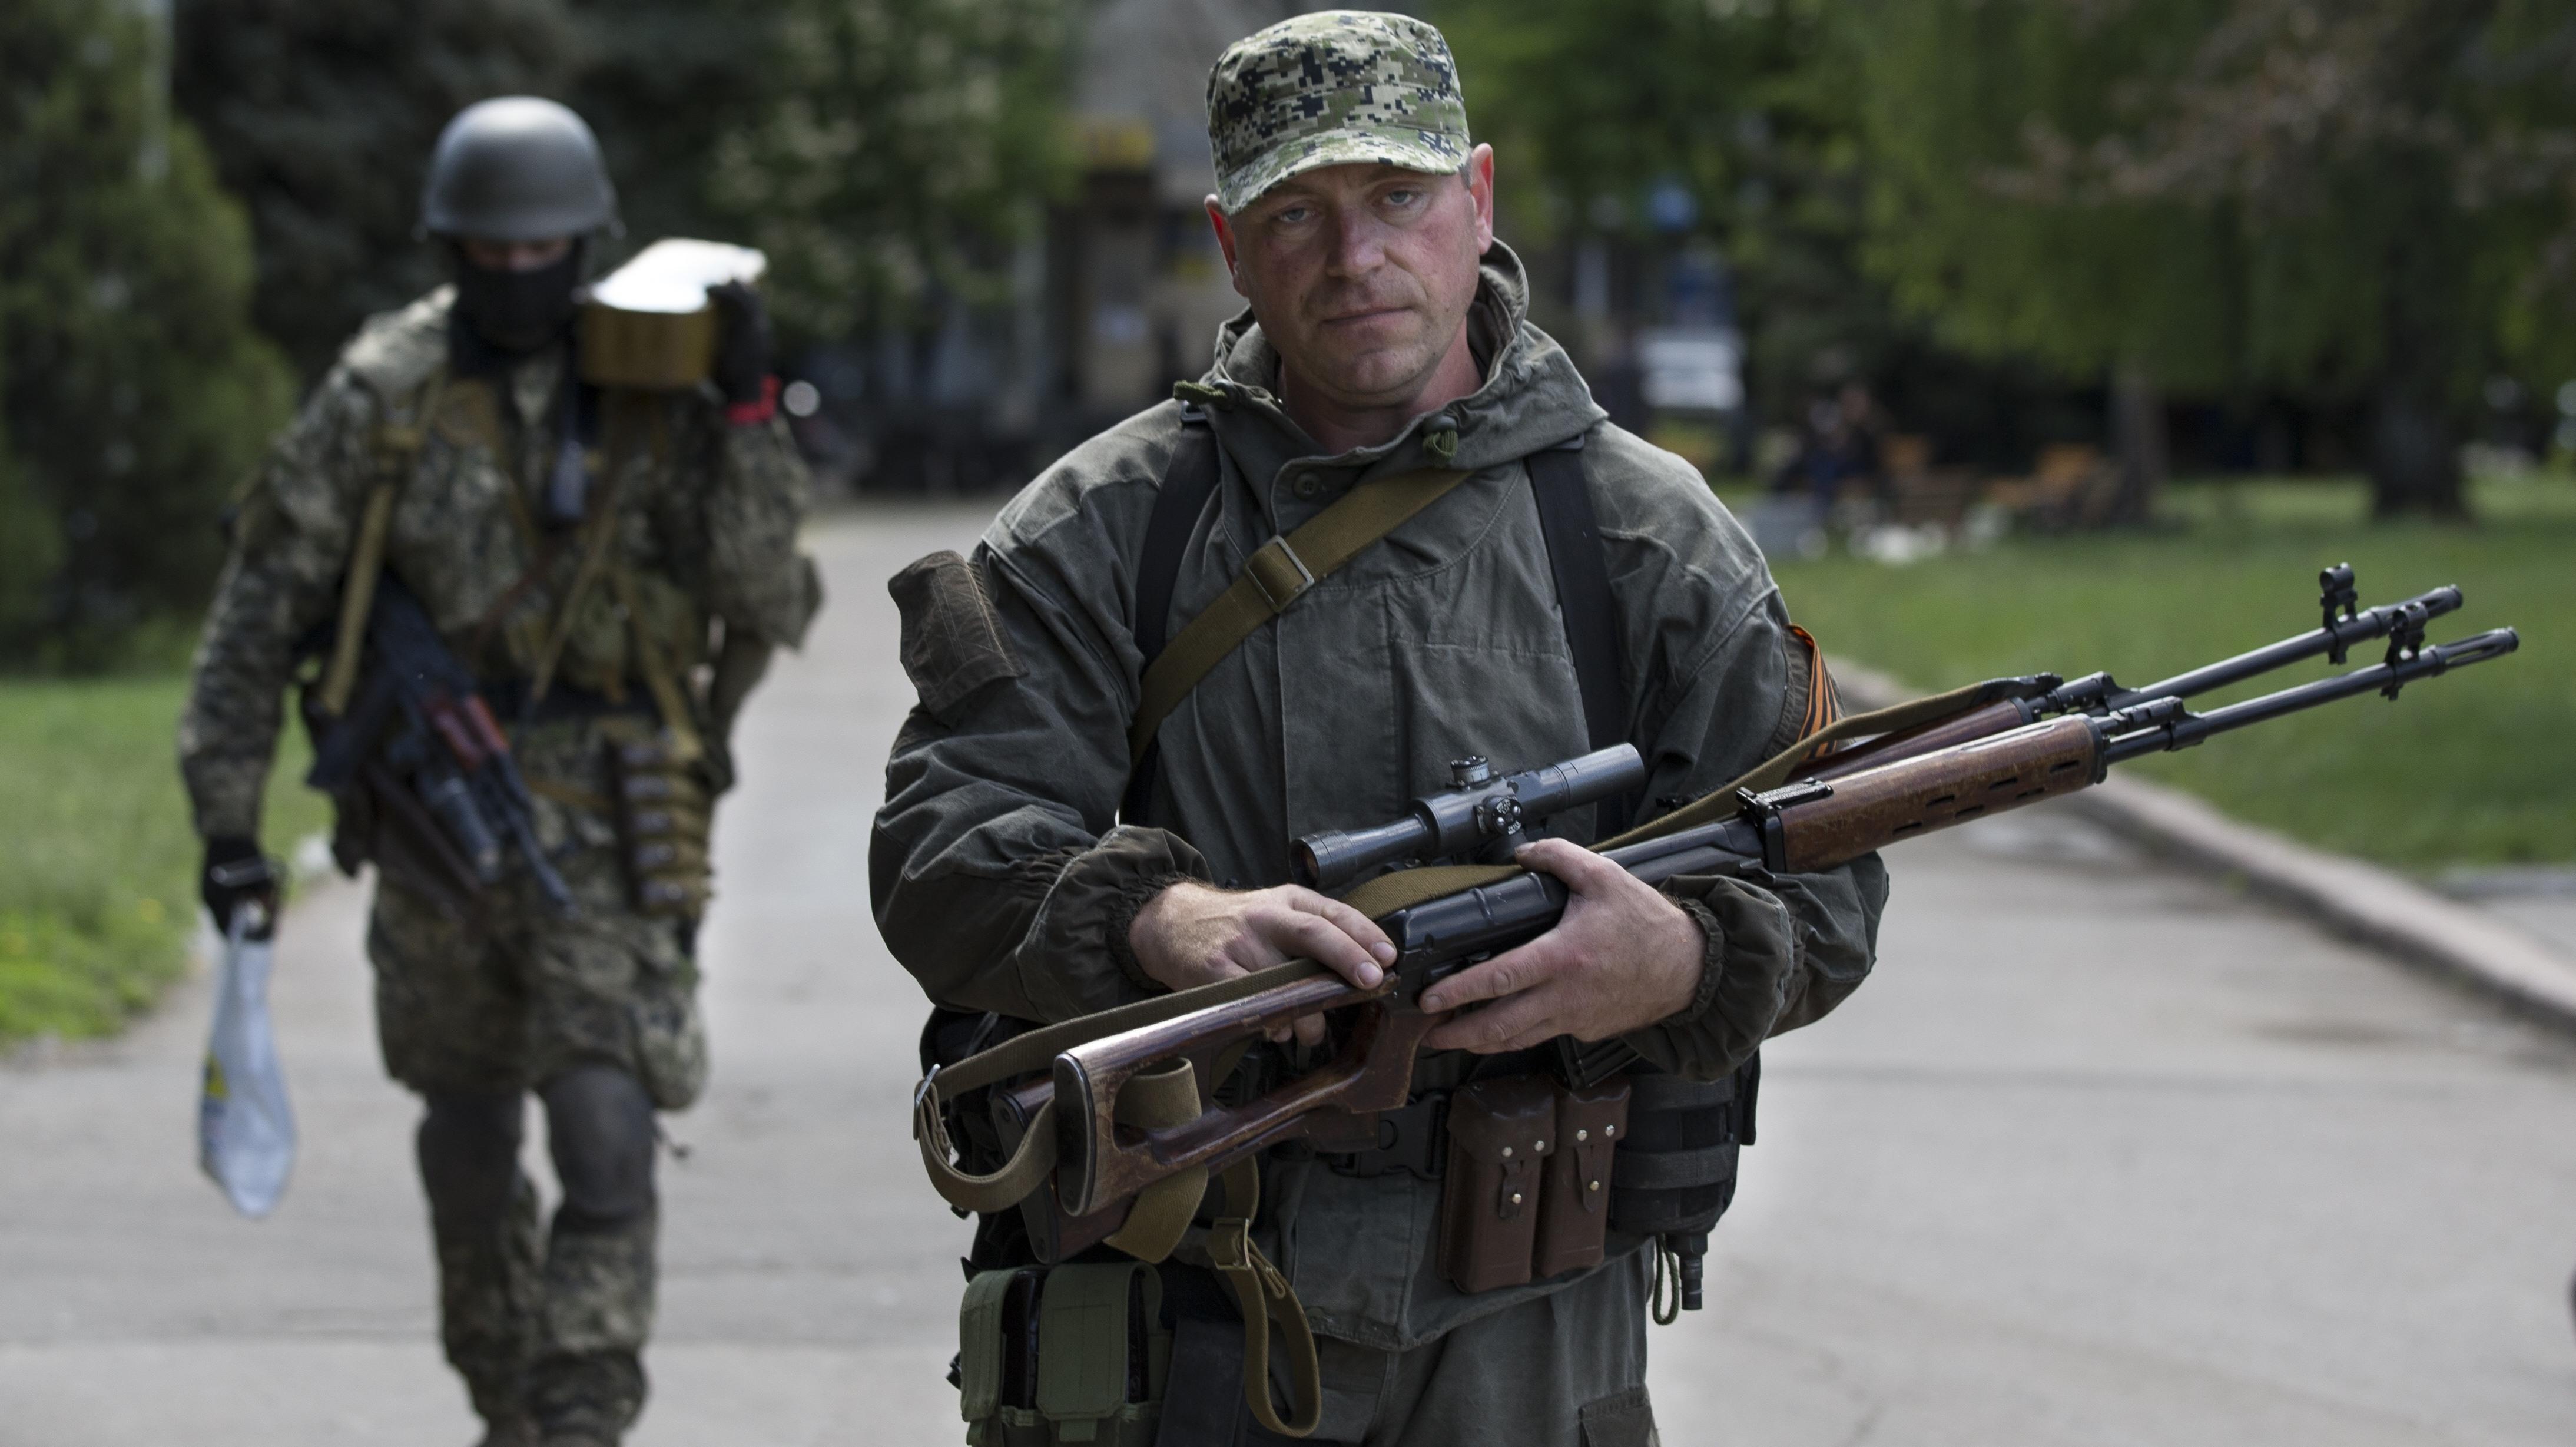 солдаты 9 мая фото